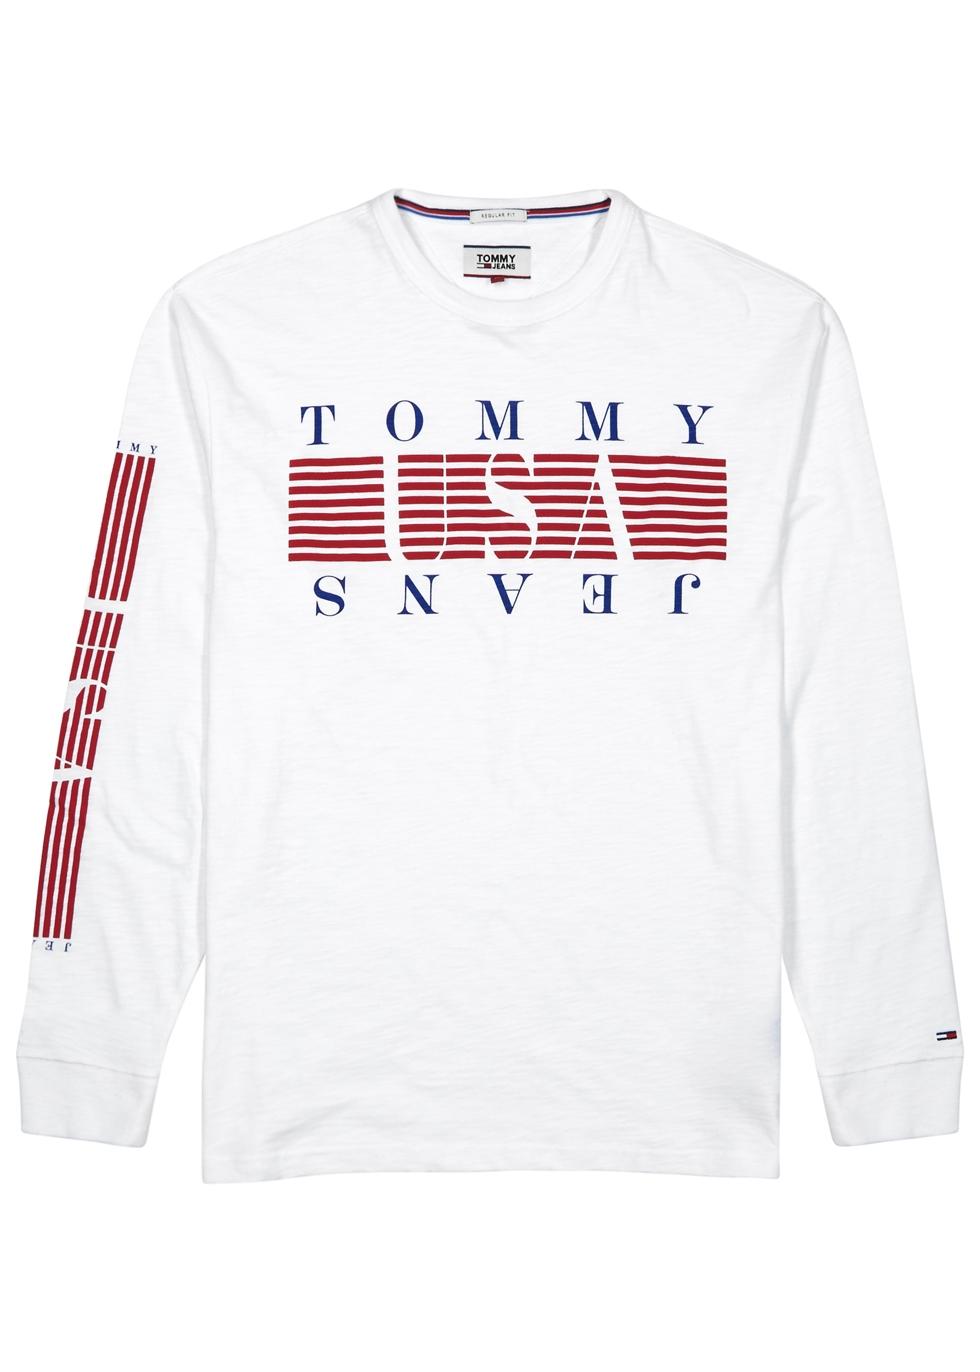 TOMMY JEANS WHITE LOGO-PRINT COTTON TOP